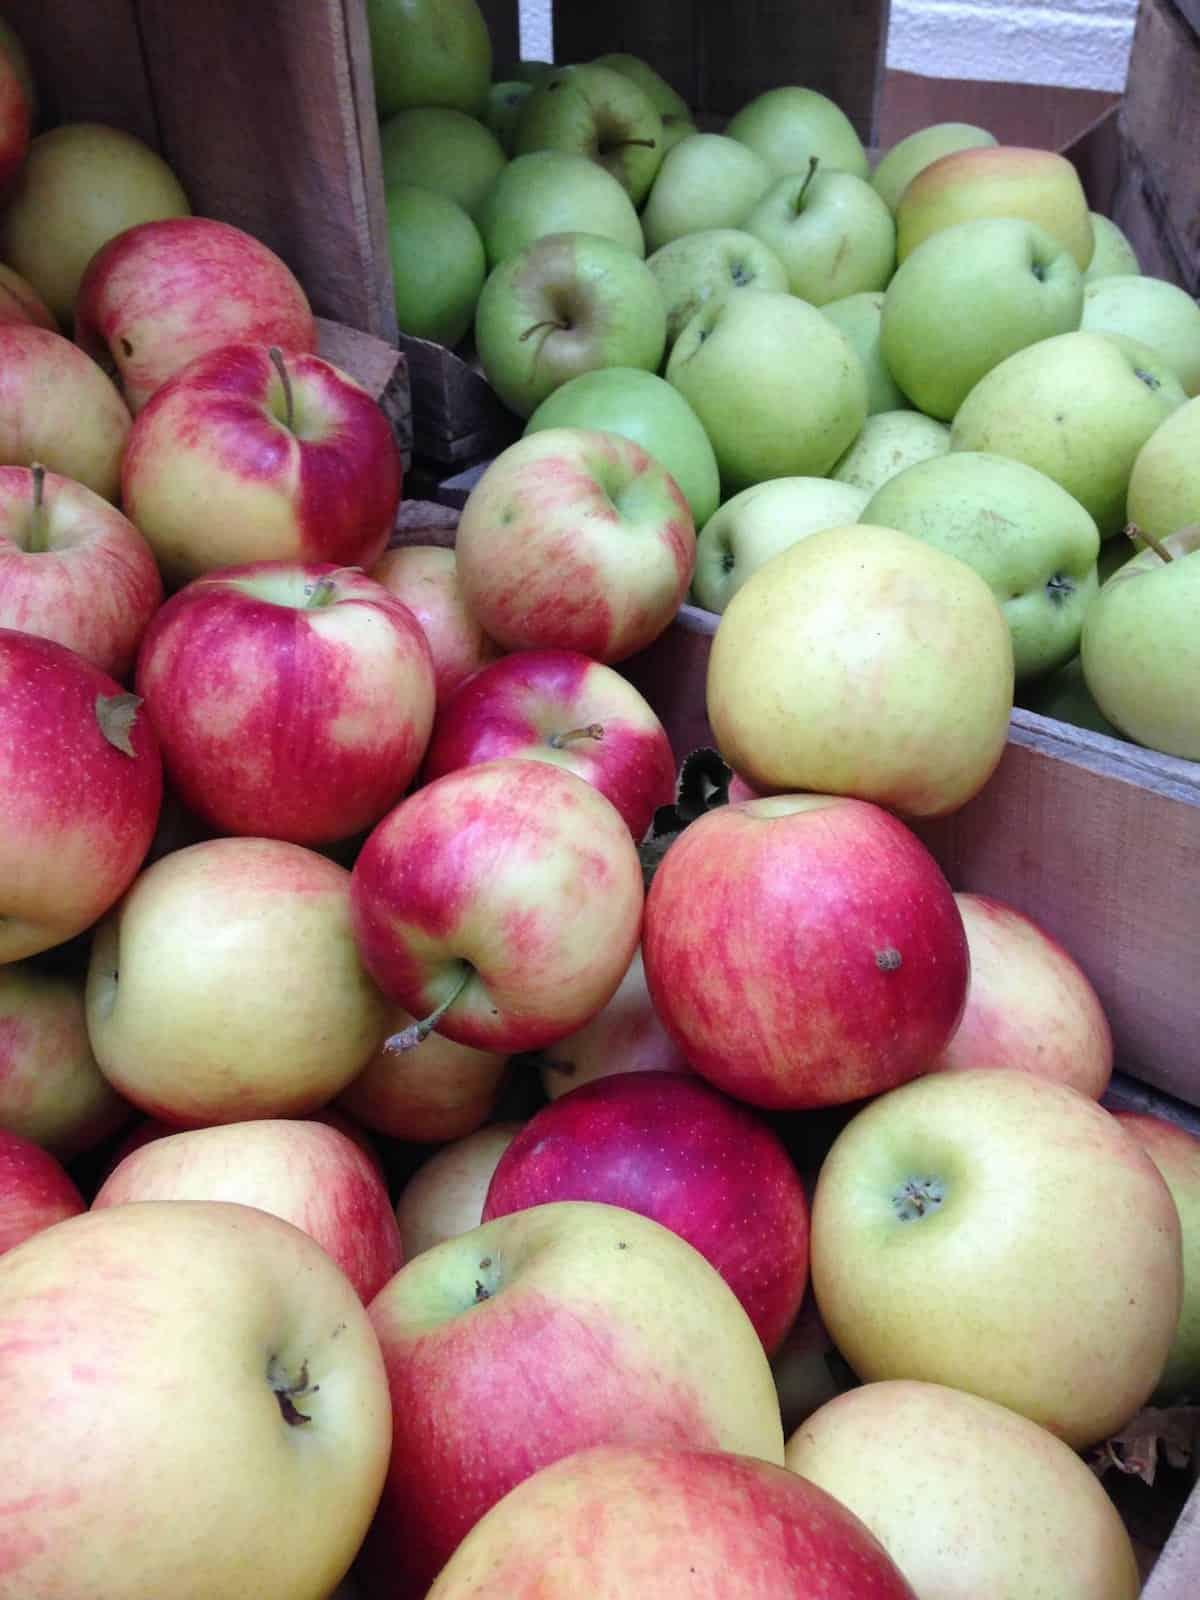 fresh picked apples make a fantastic fennel apple pie